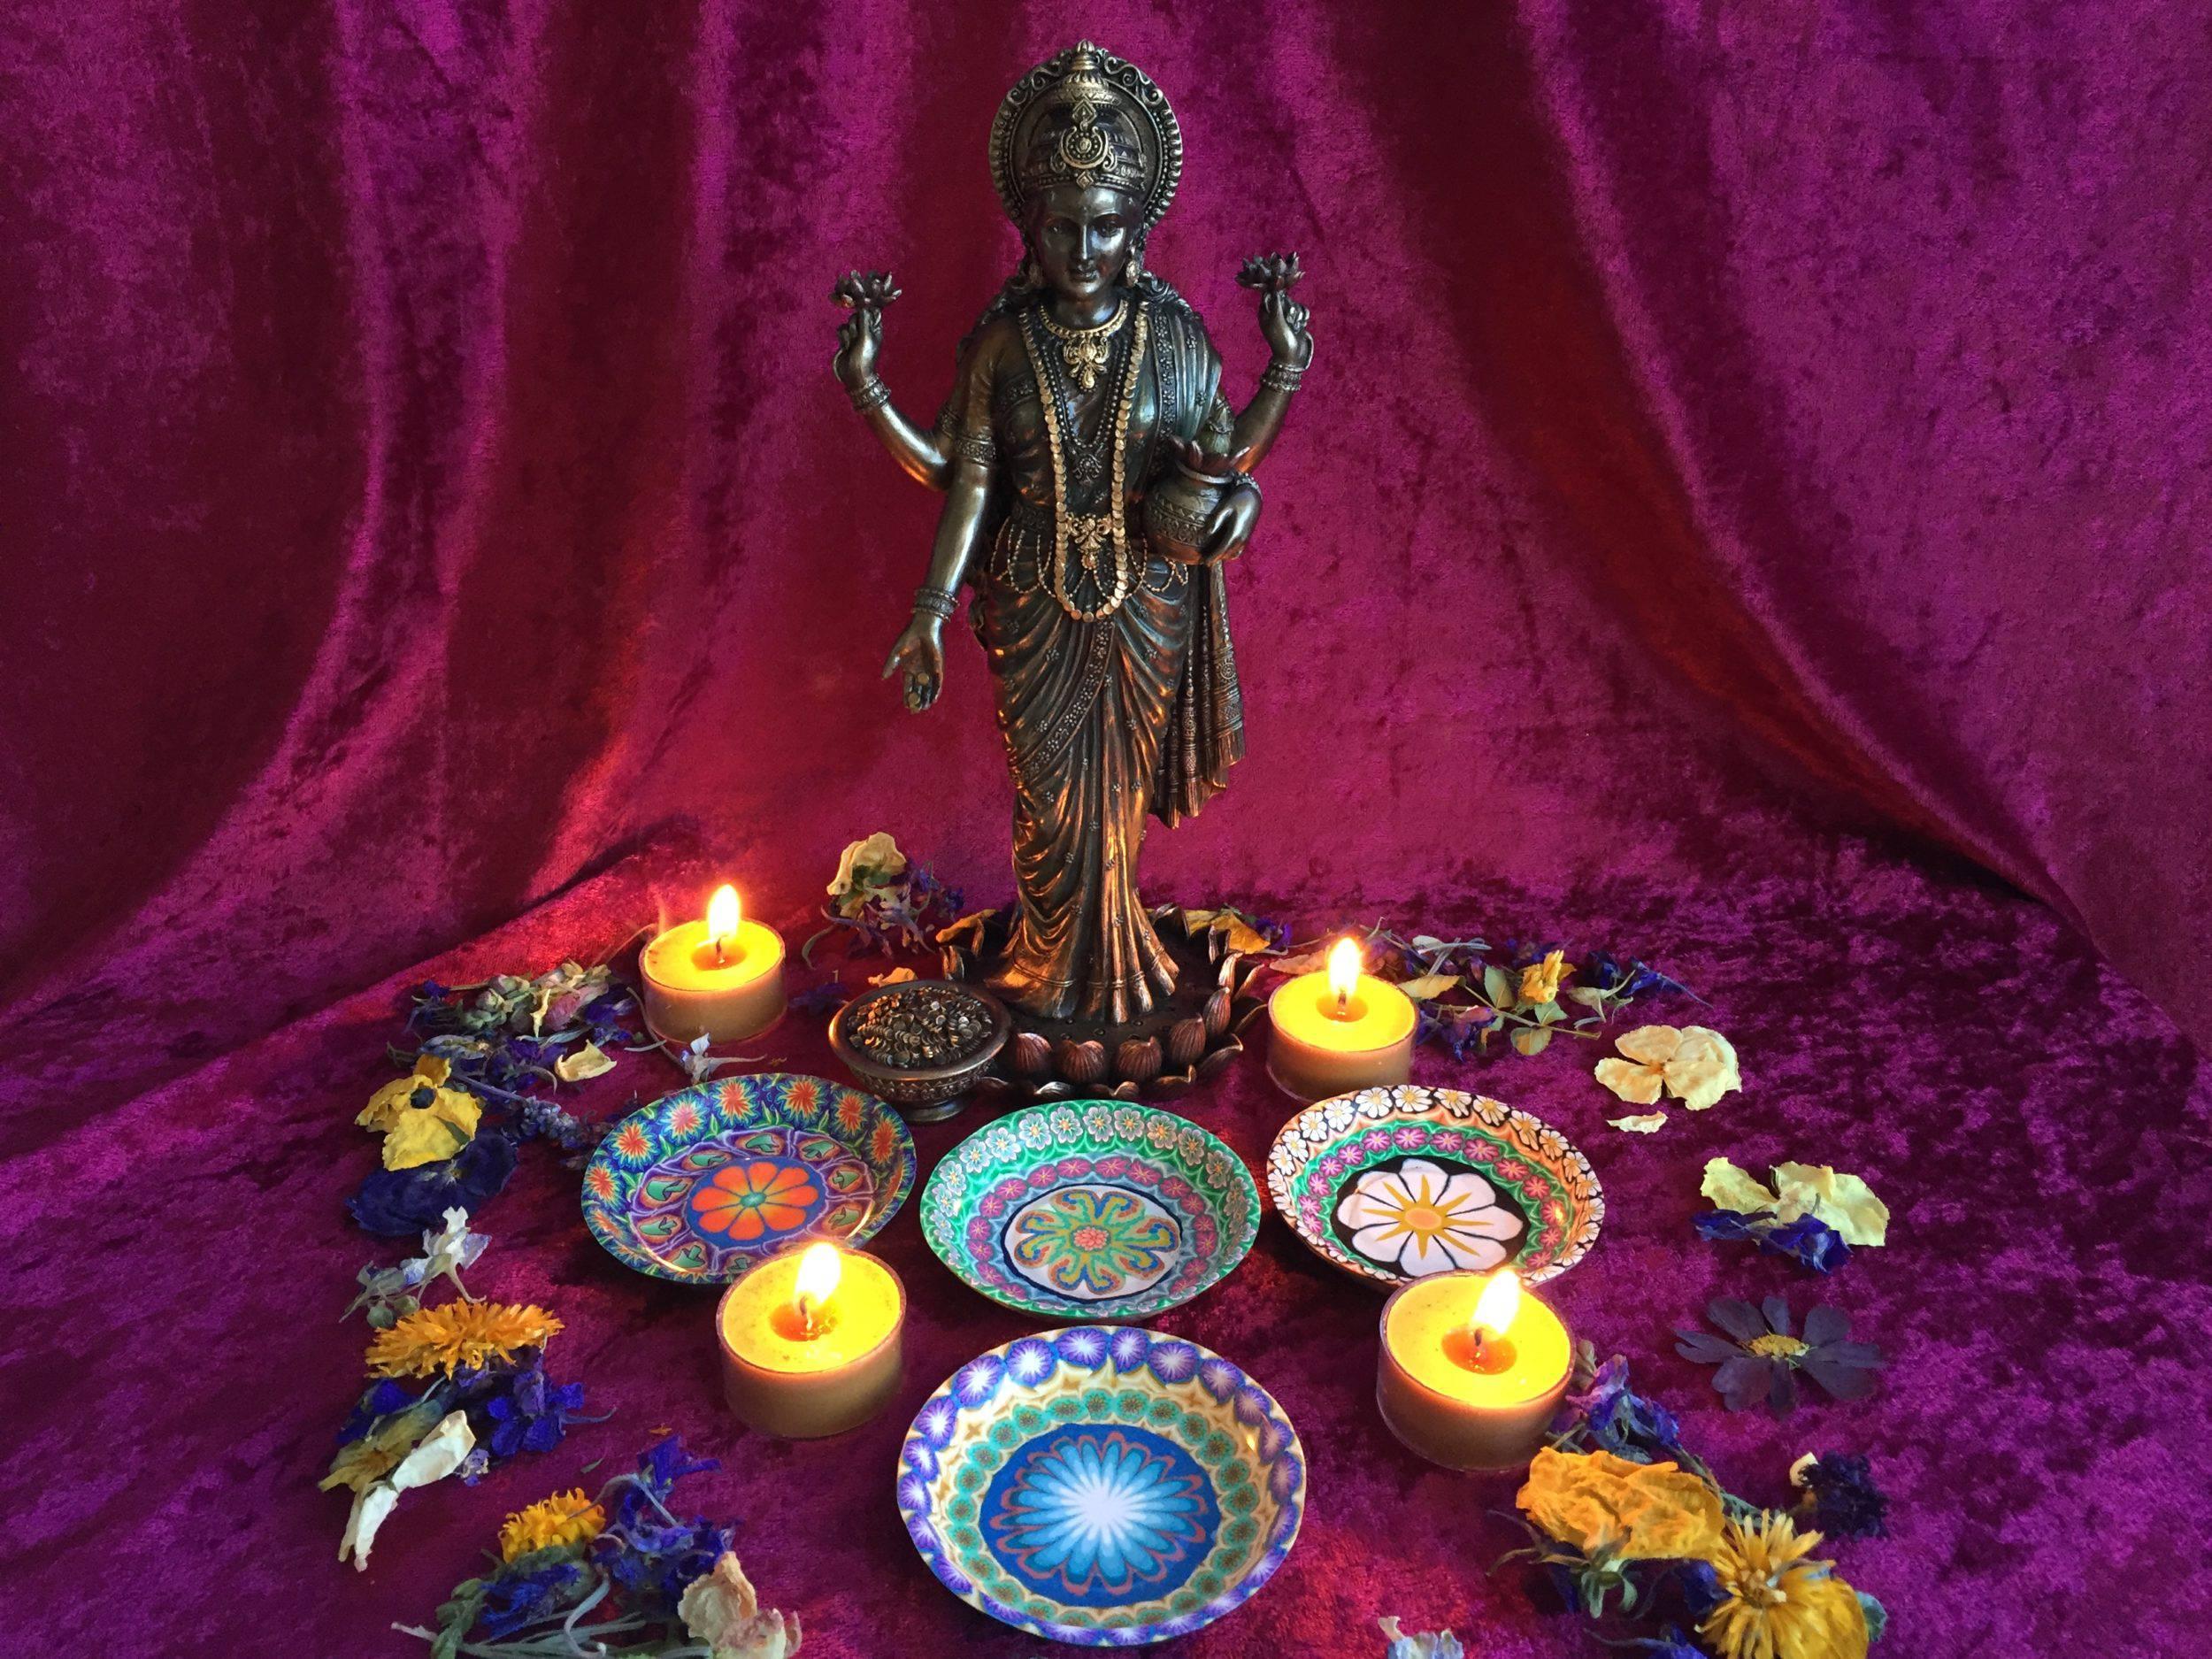 Celebrating Diwali, The Festival of Lights